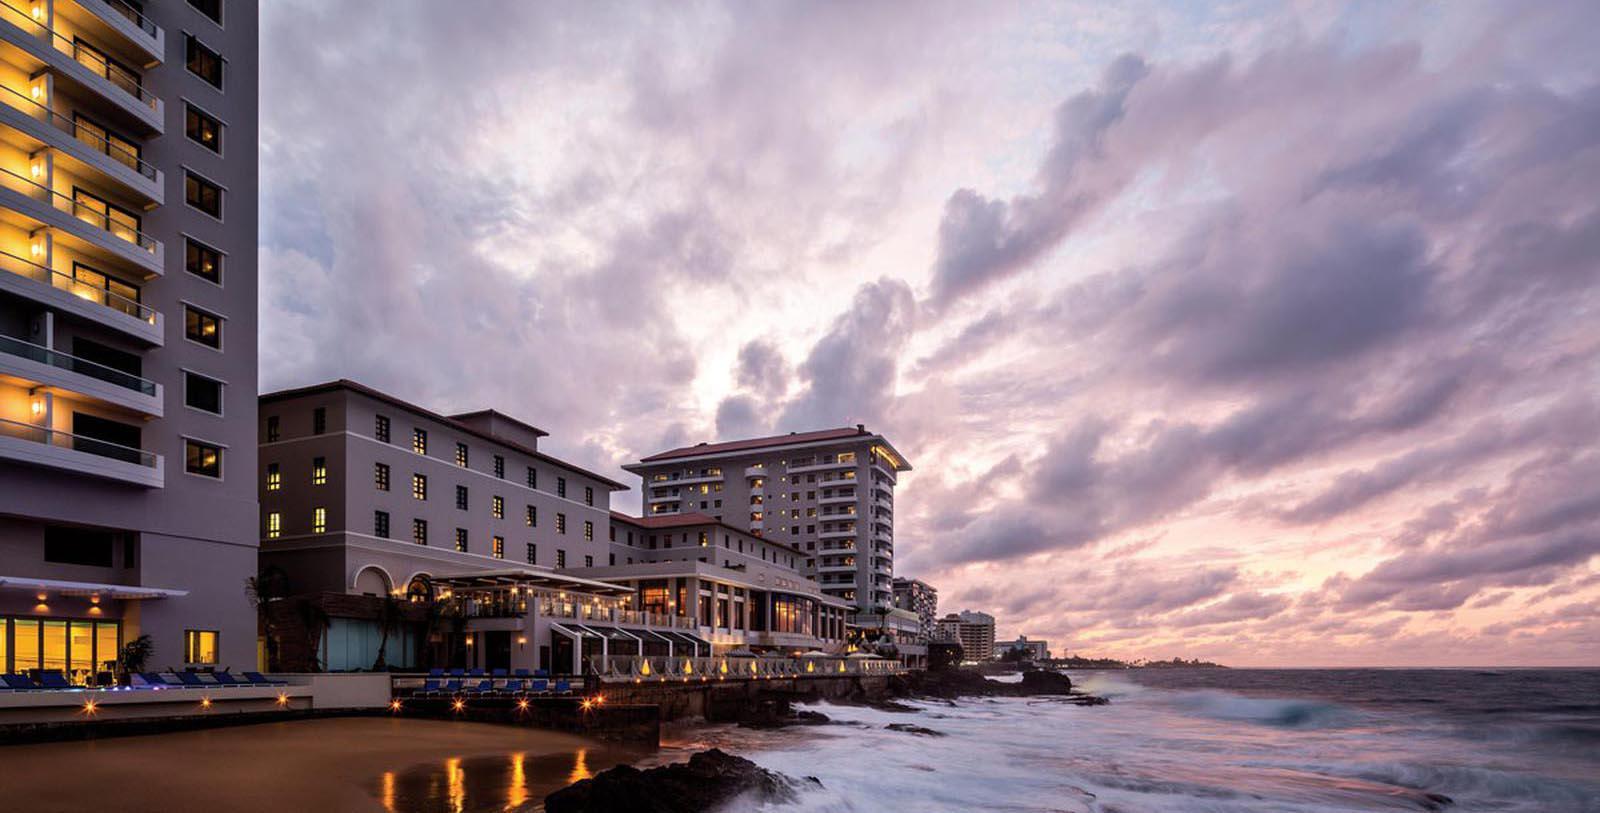 Image of hotel exterior at Condado Vanderbilt Hotel, 1919, Member of Historic Hotels of America, in San Juan, Puerto Rico, Special Offers, Discounted Rates, Families, Romantic Escape, Honeymoons, Anniversaries, Reunions